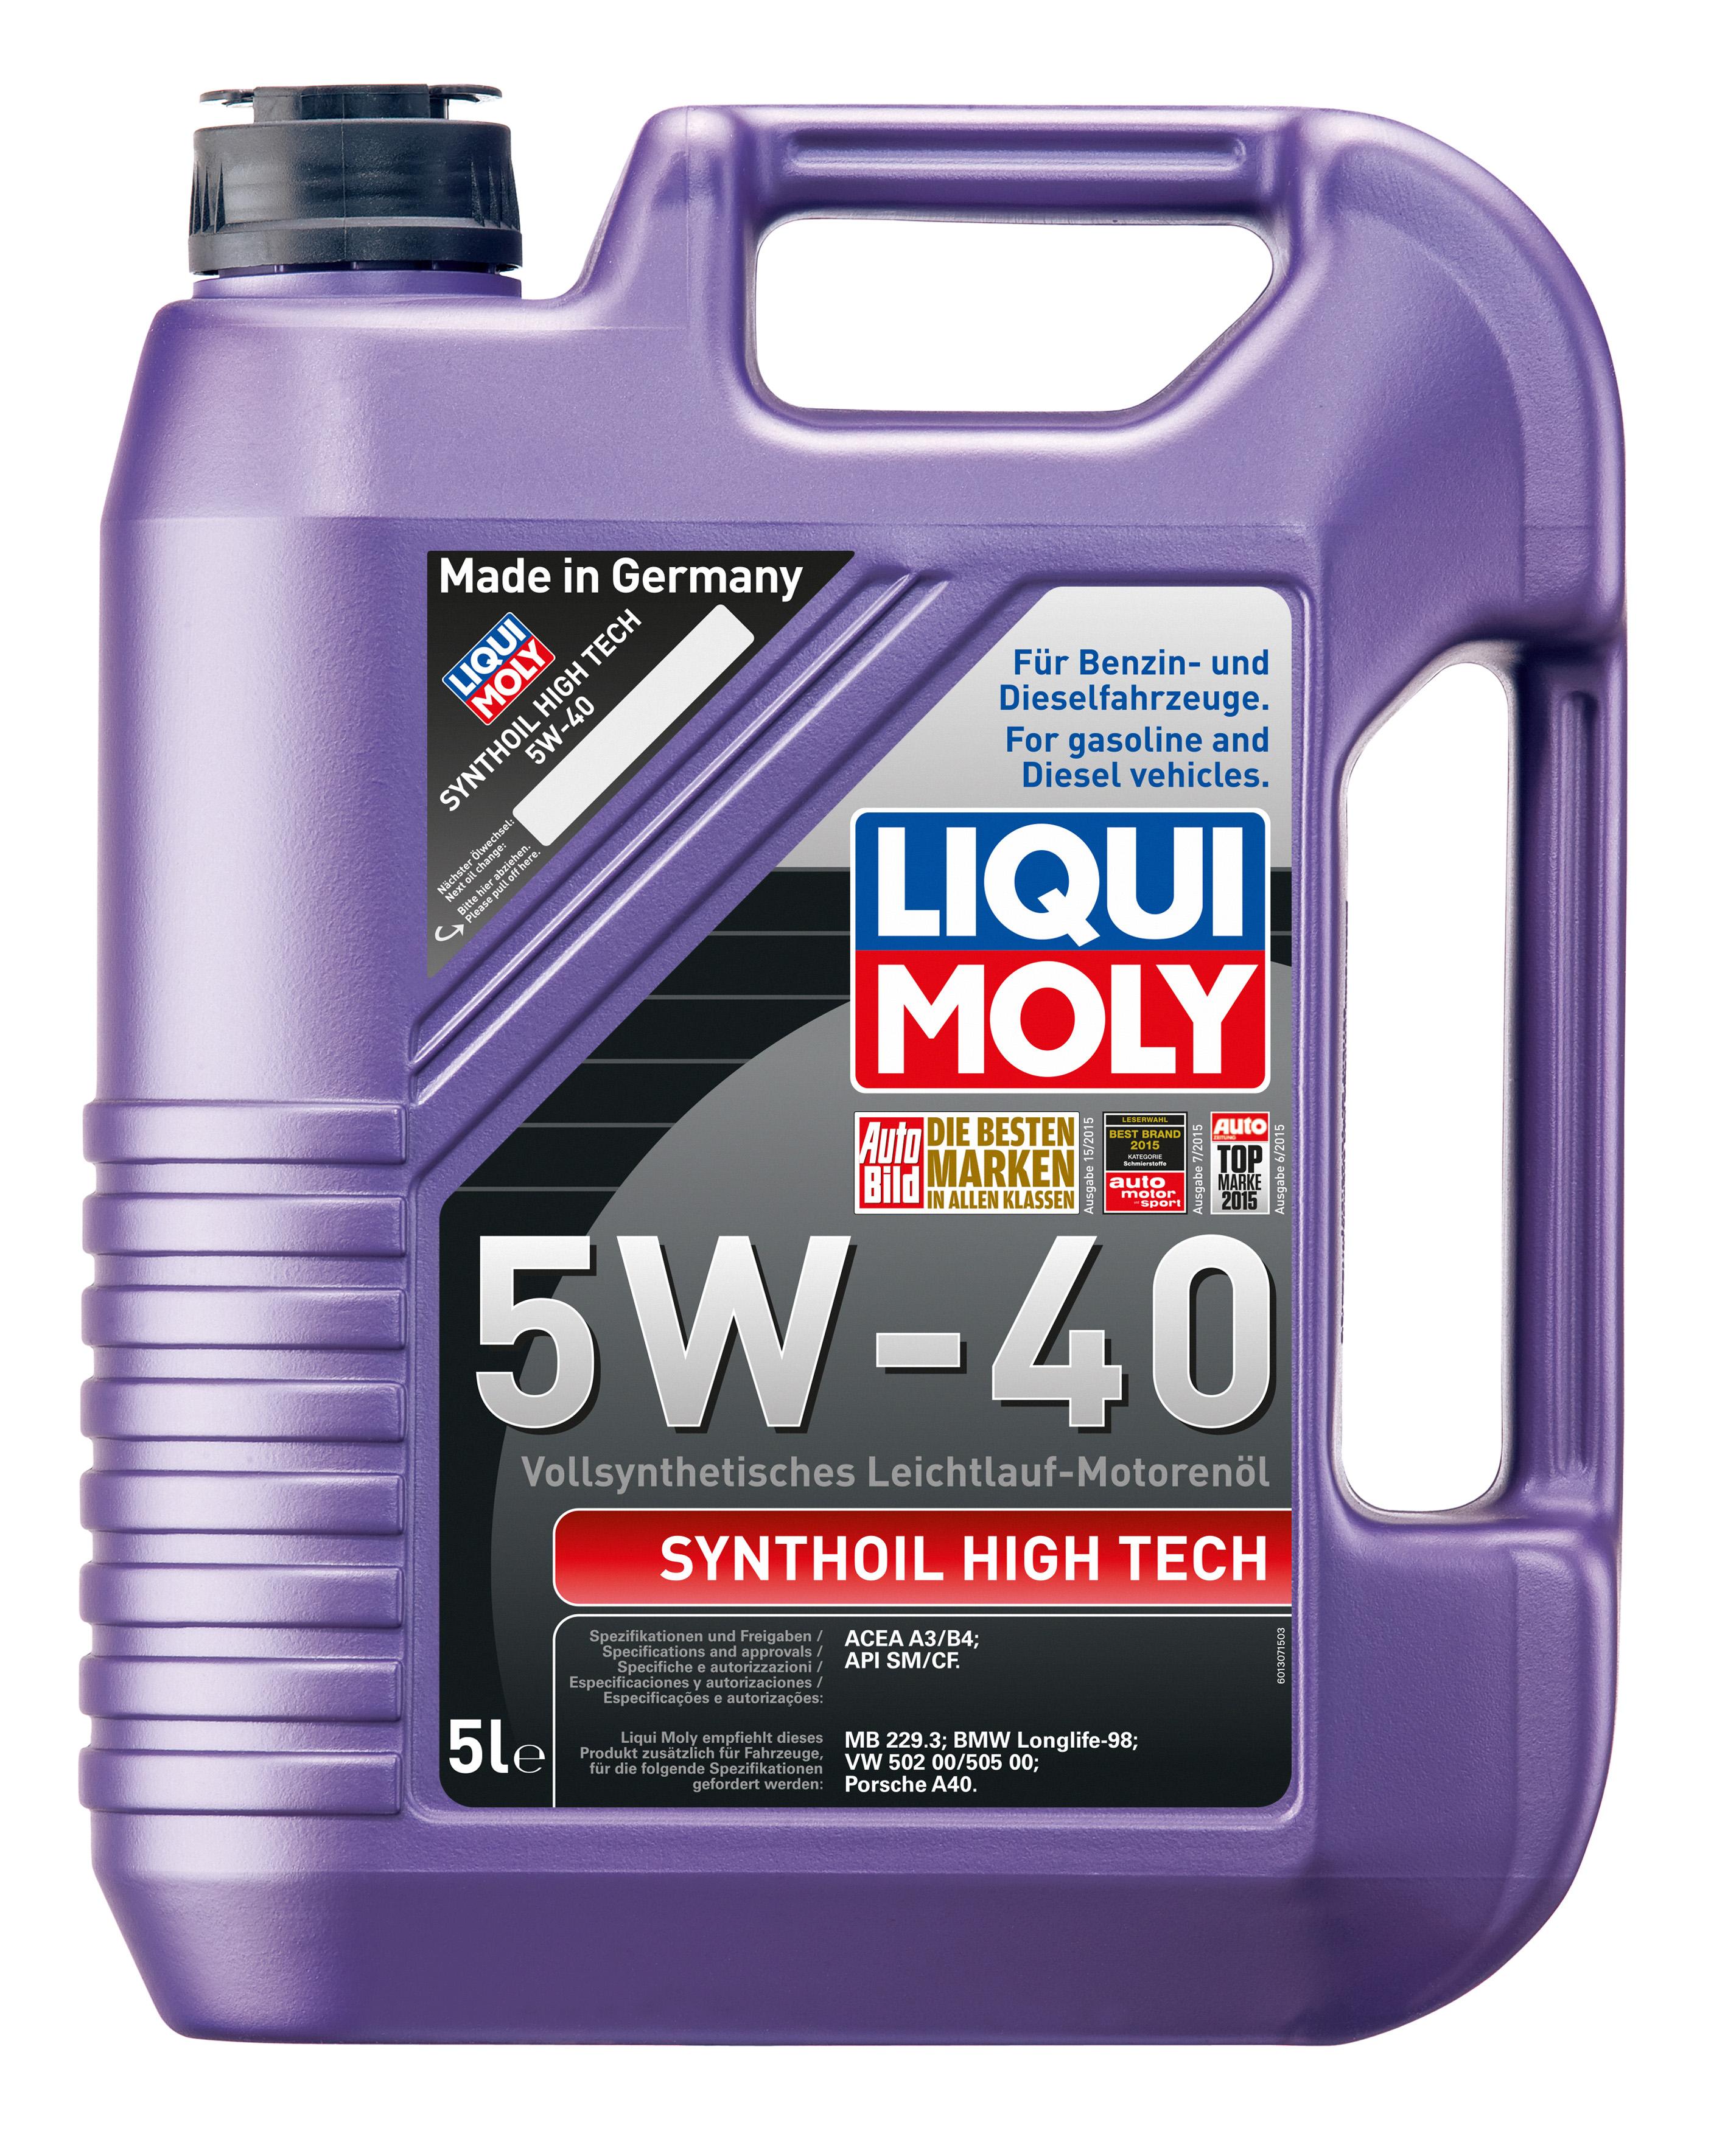 Синтетическое моторное масло Synthoil High Tech 5W-40